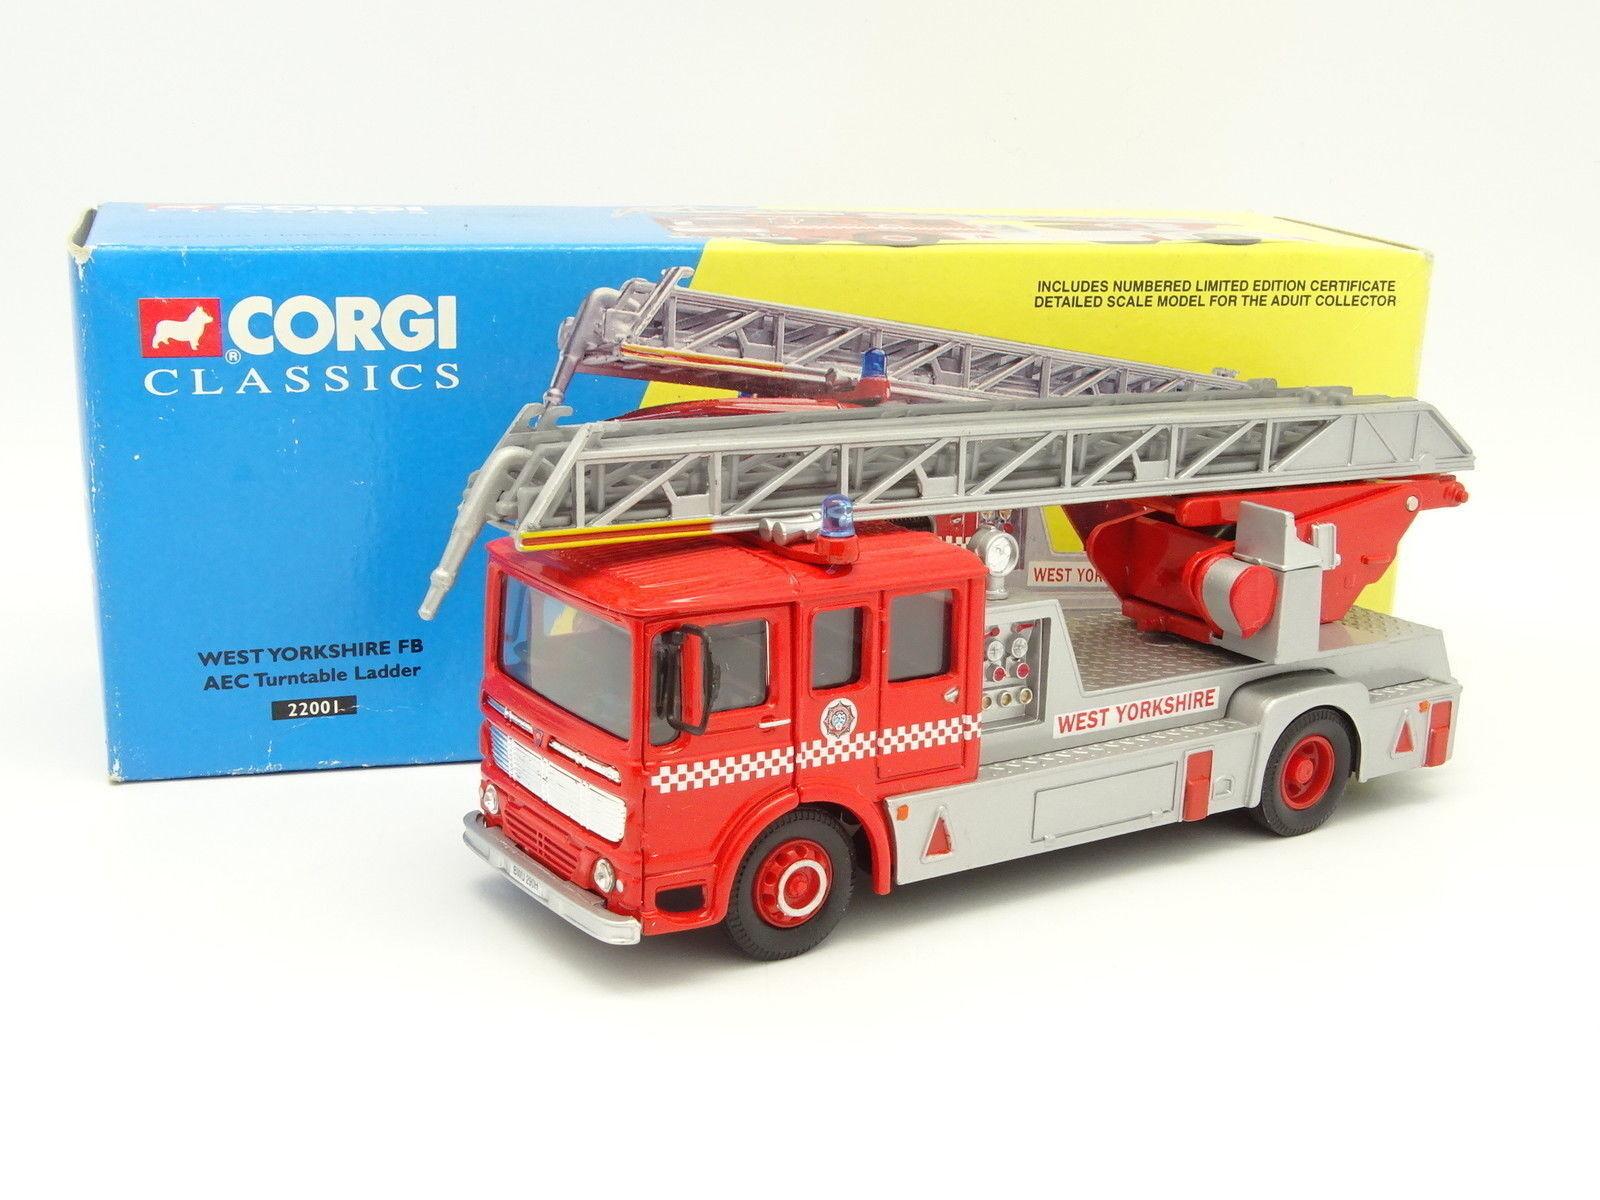 Corgi 1 50 - AEC TURNTABLE LADDER yorkshire fire brigade scale Firemen